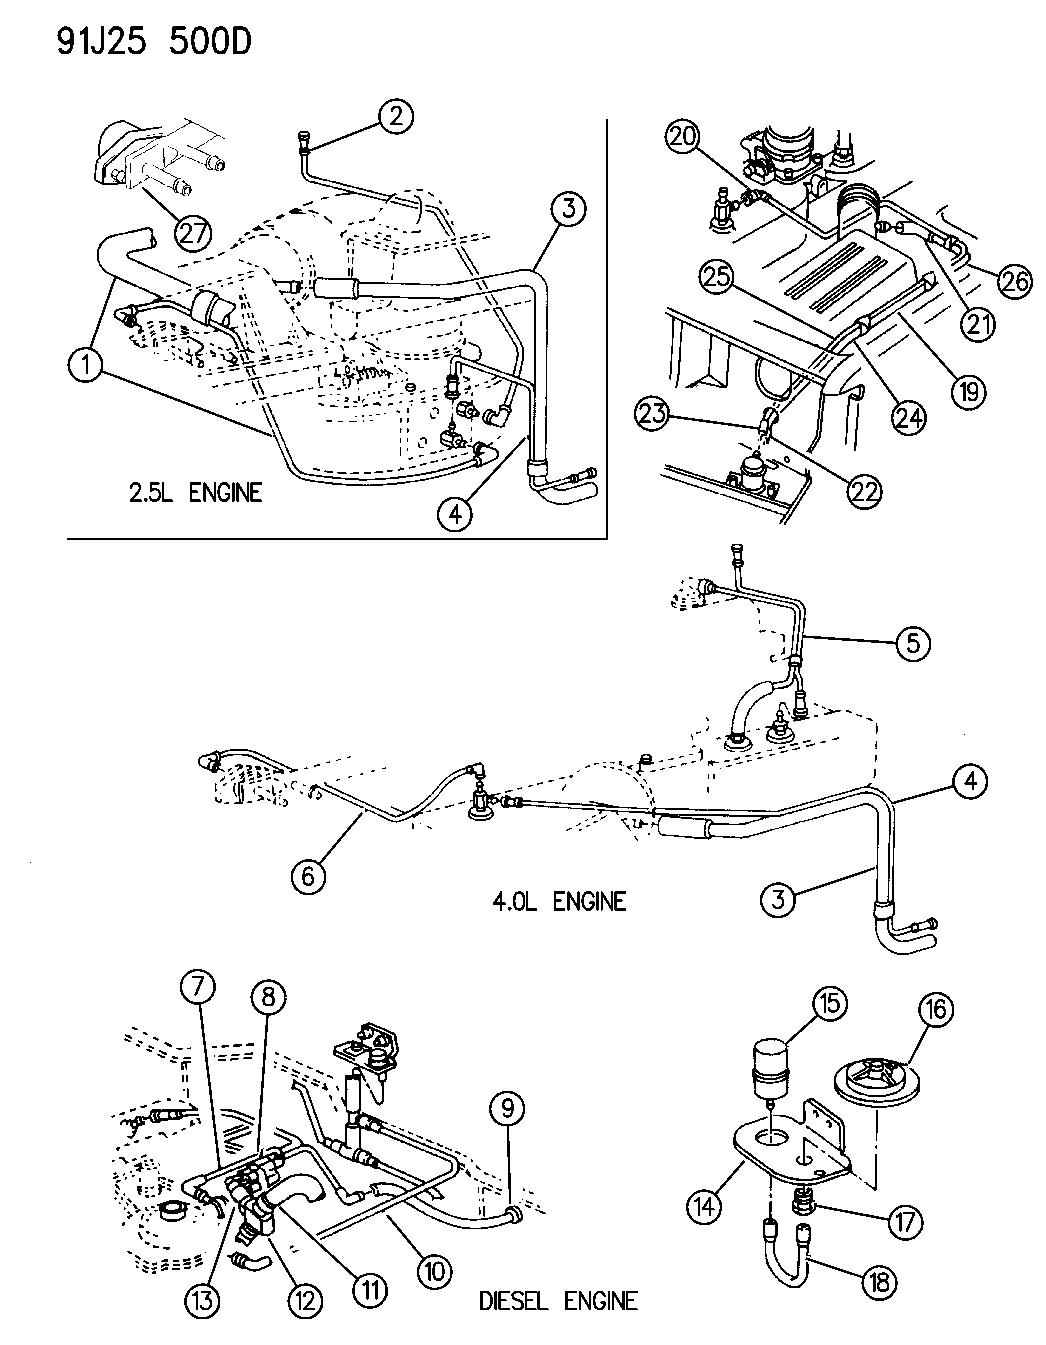 5227635 - Genuine Jeep SOLENOID-DUTY CYCLE PURGE